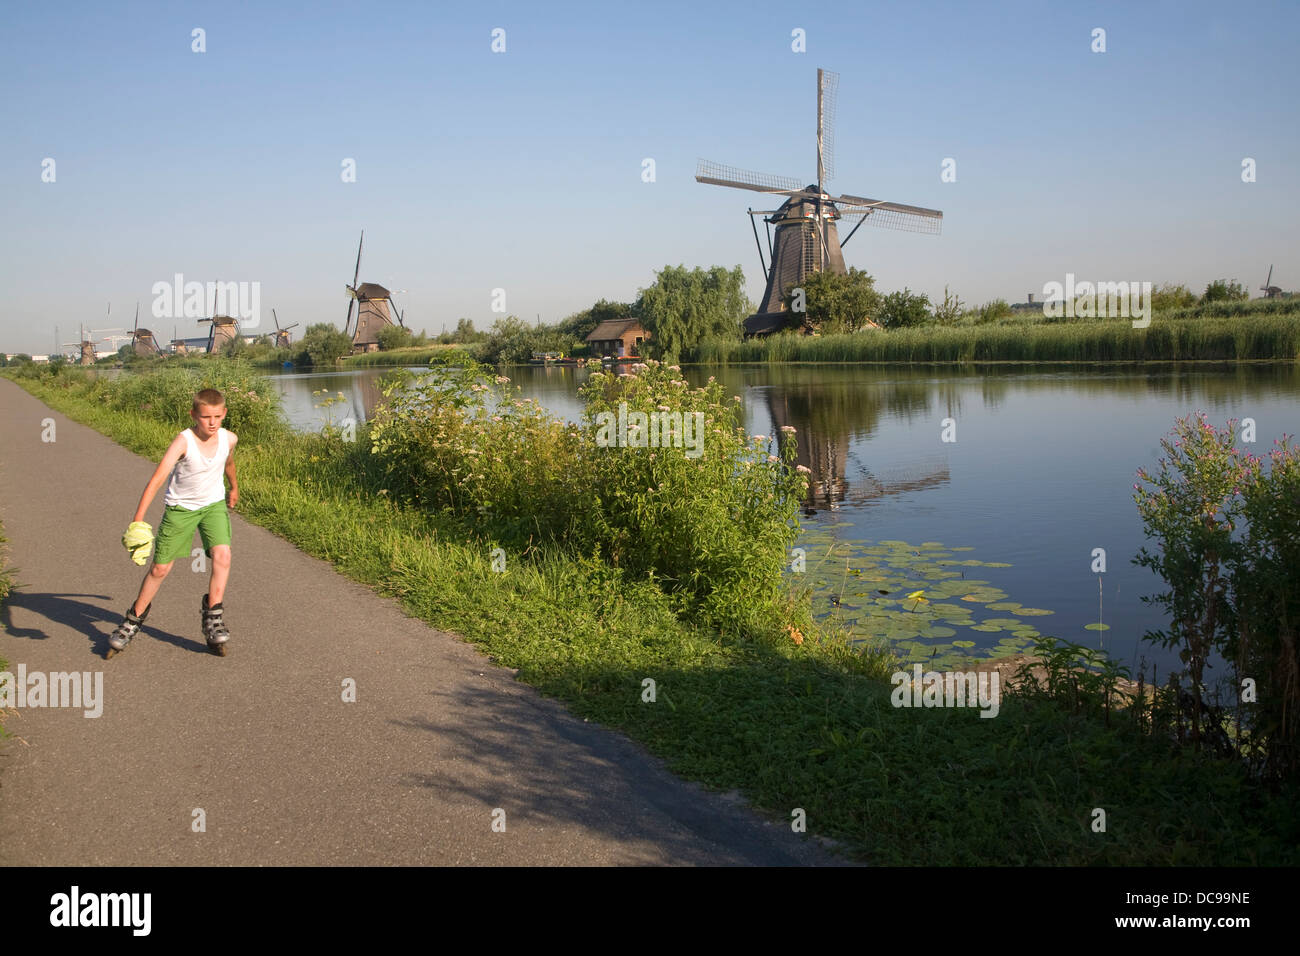 Traditional Dutch windmills Kinderdijk Netherlands boy roller skating on path Stock Photo